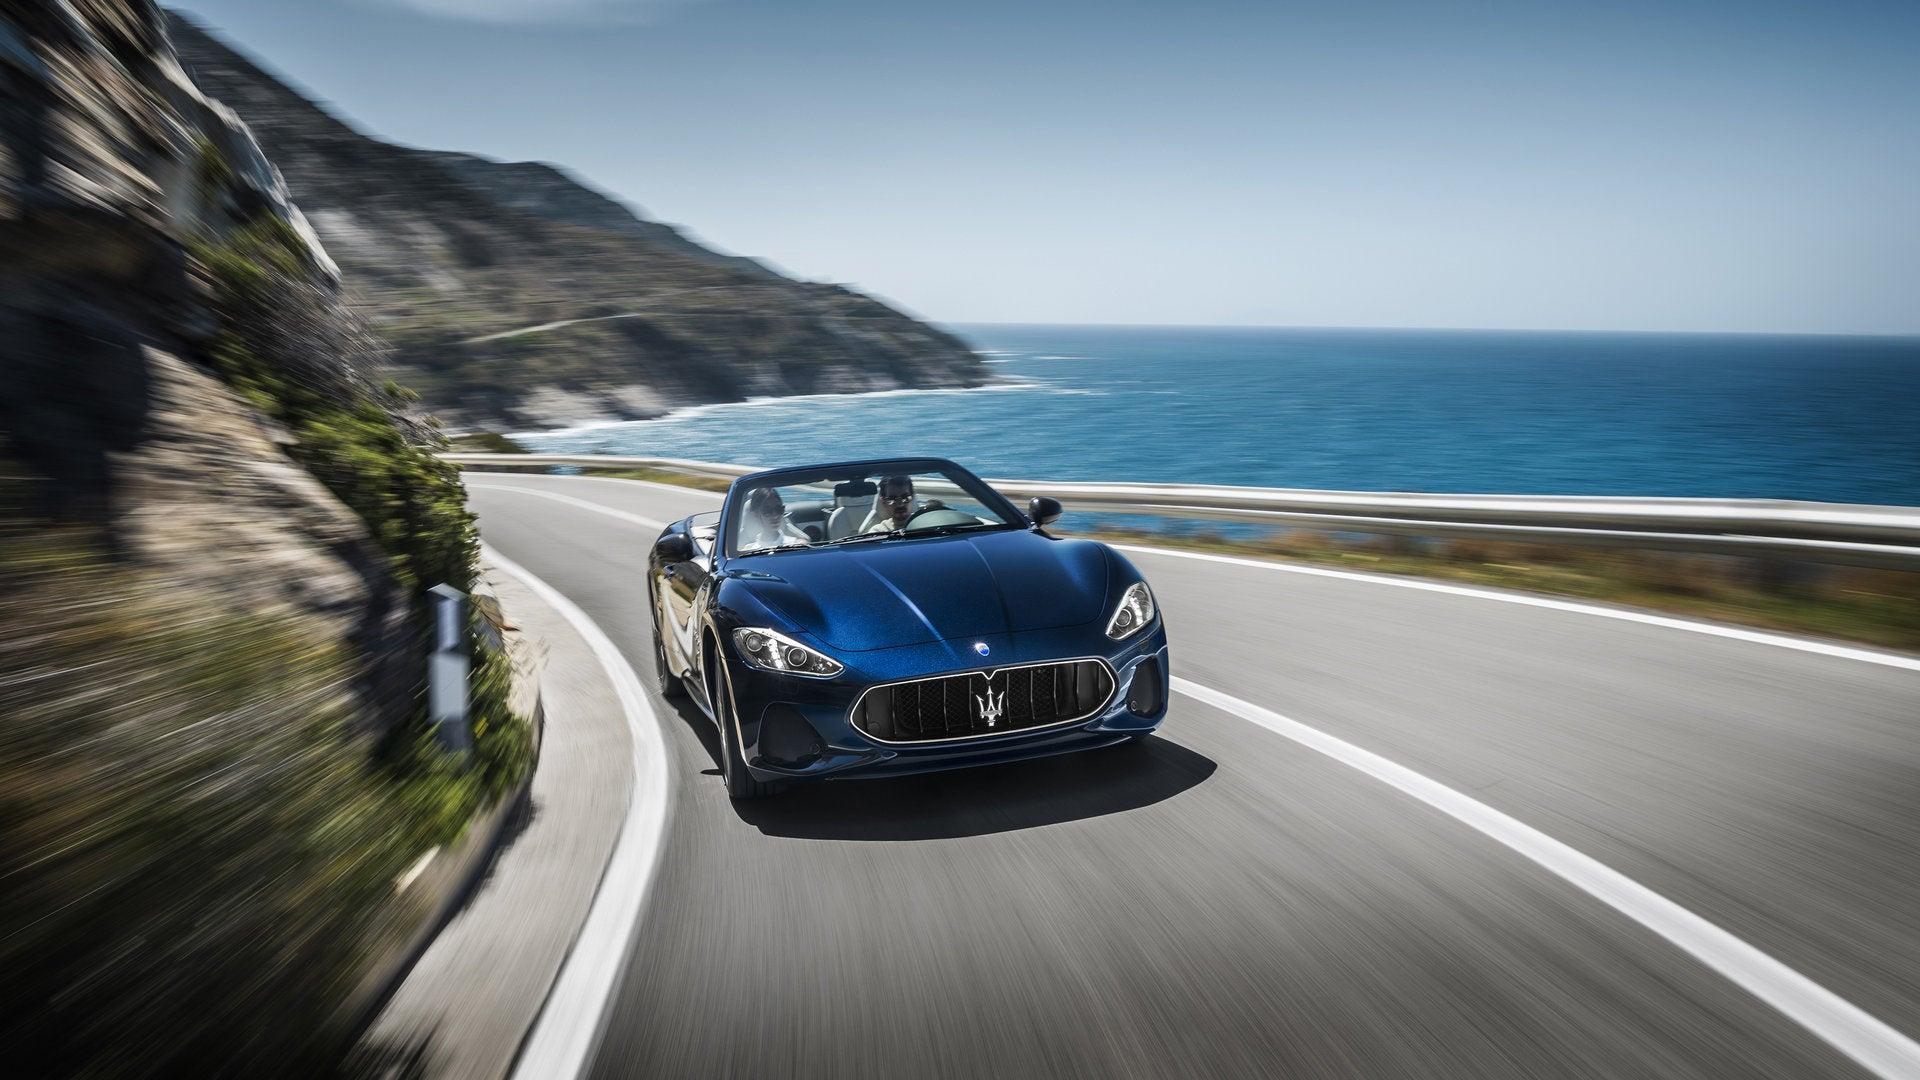 2019 Maserati Gt Convertible